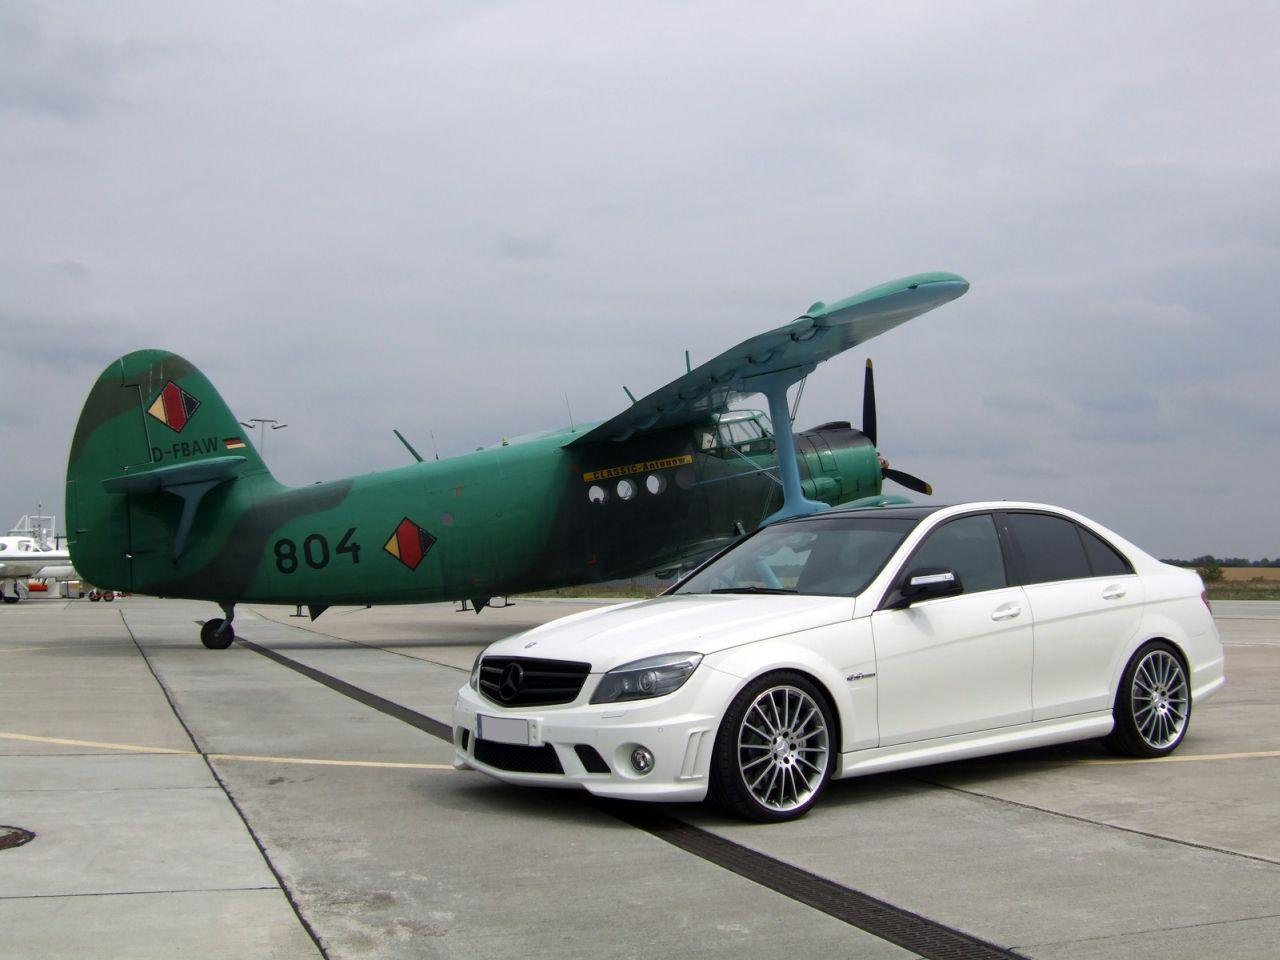 http://1.bp.blogspot.com/-qqzALJvg1R0/T_0uUNNiU1I/AAAAAAAADlE/jn8sXv6rIAo/s1600/Mercedes-Benz-C63-AMG-Wallpaper.jpg